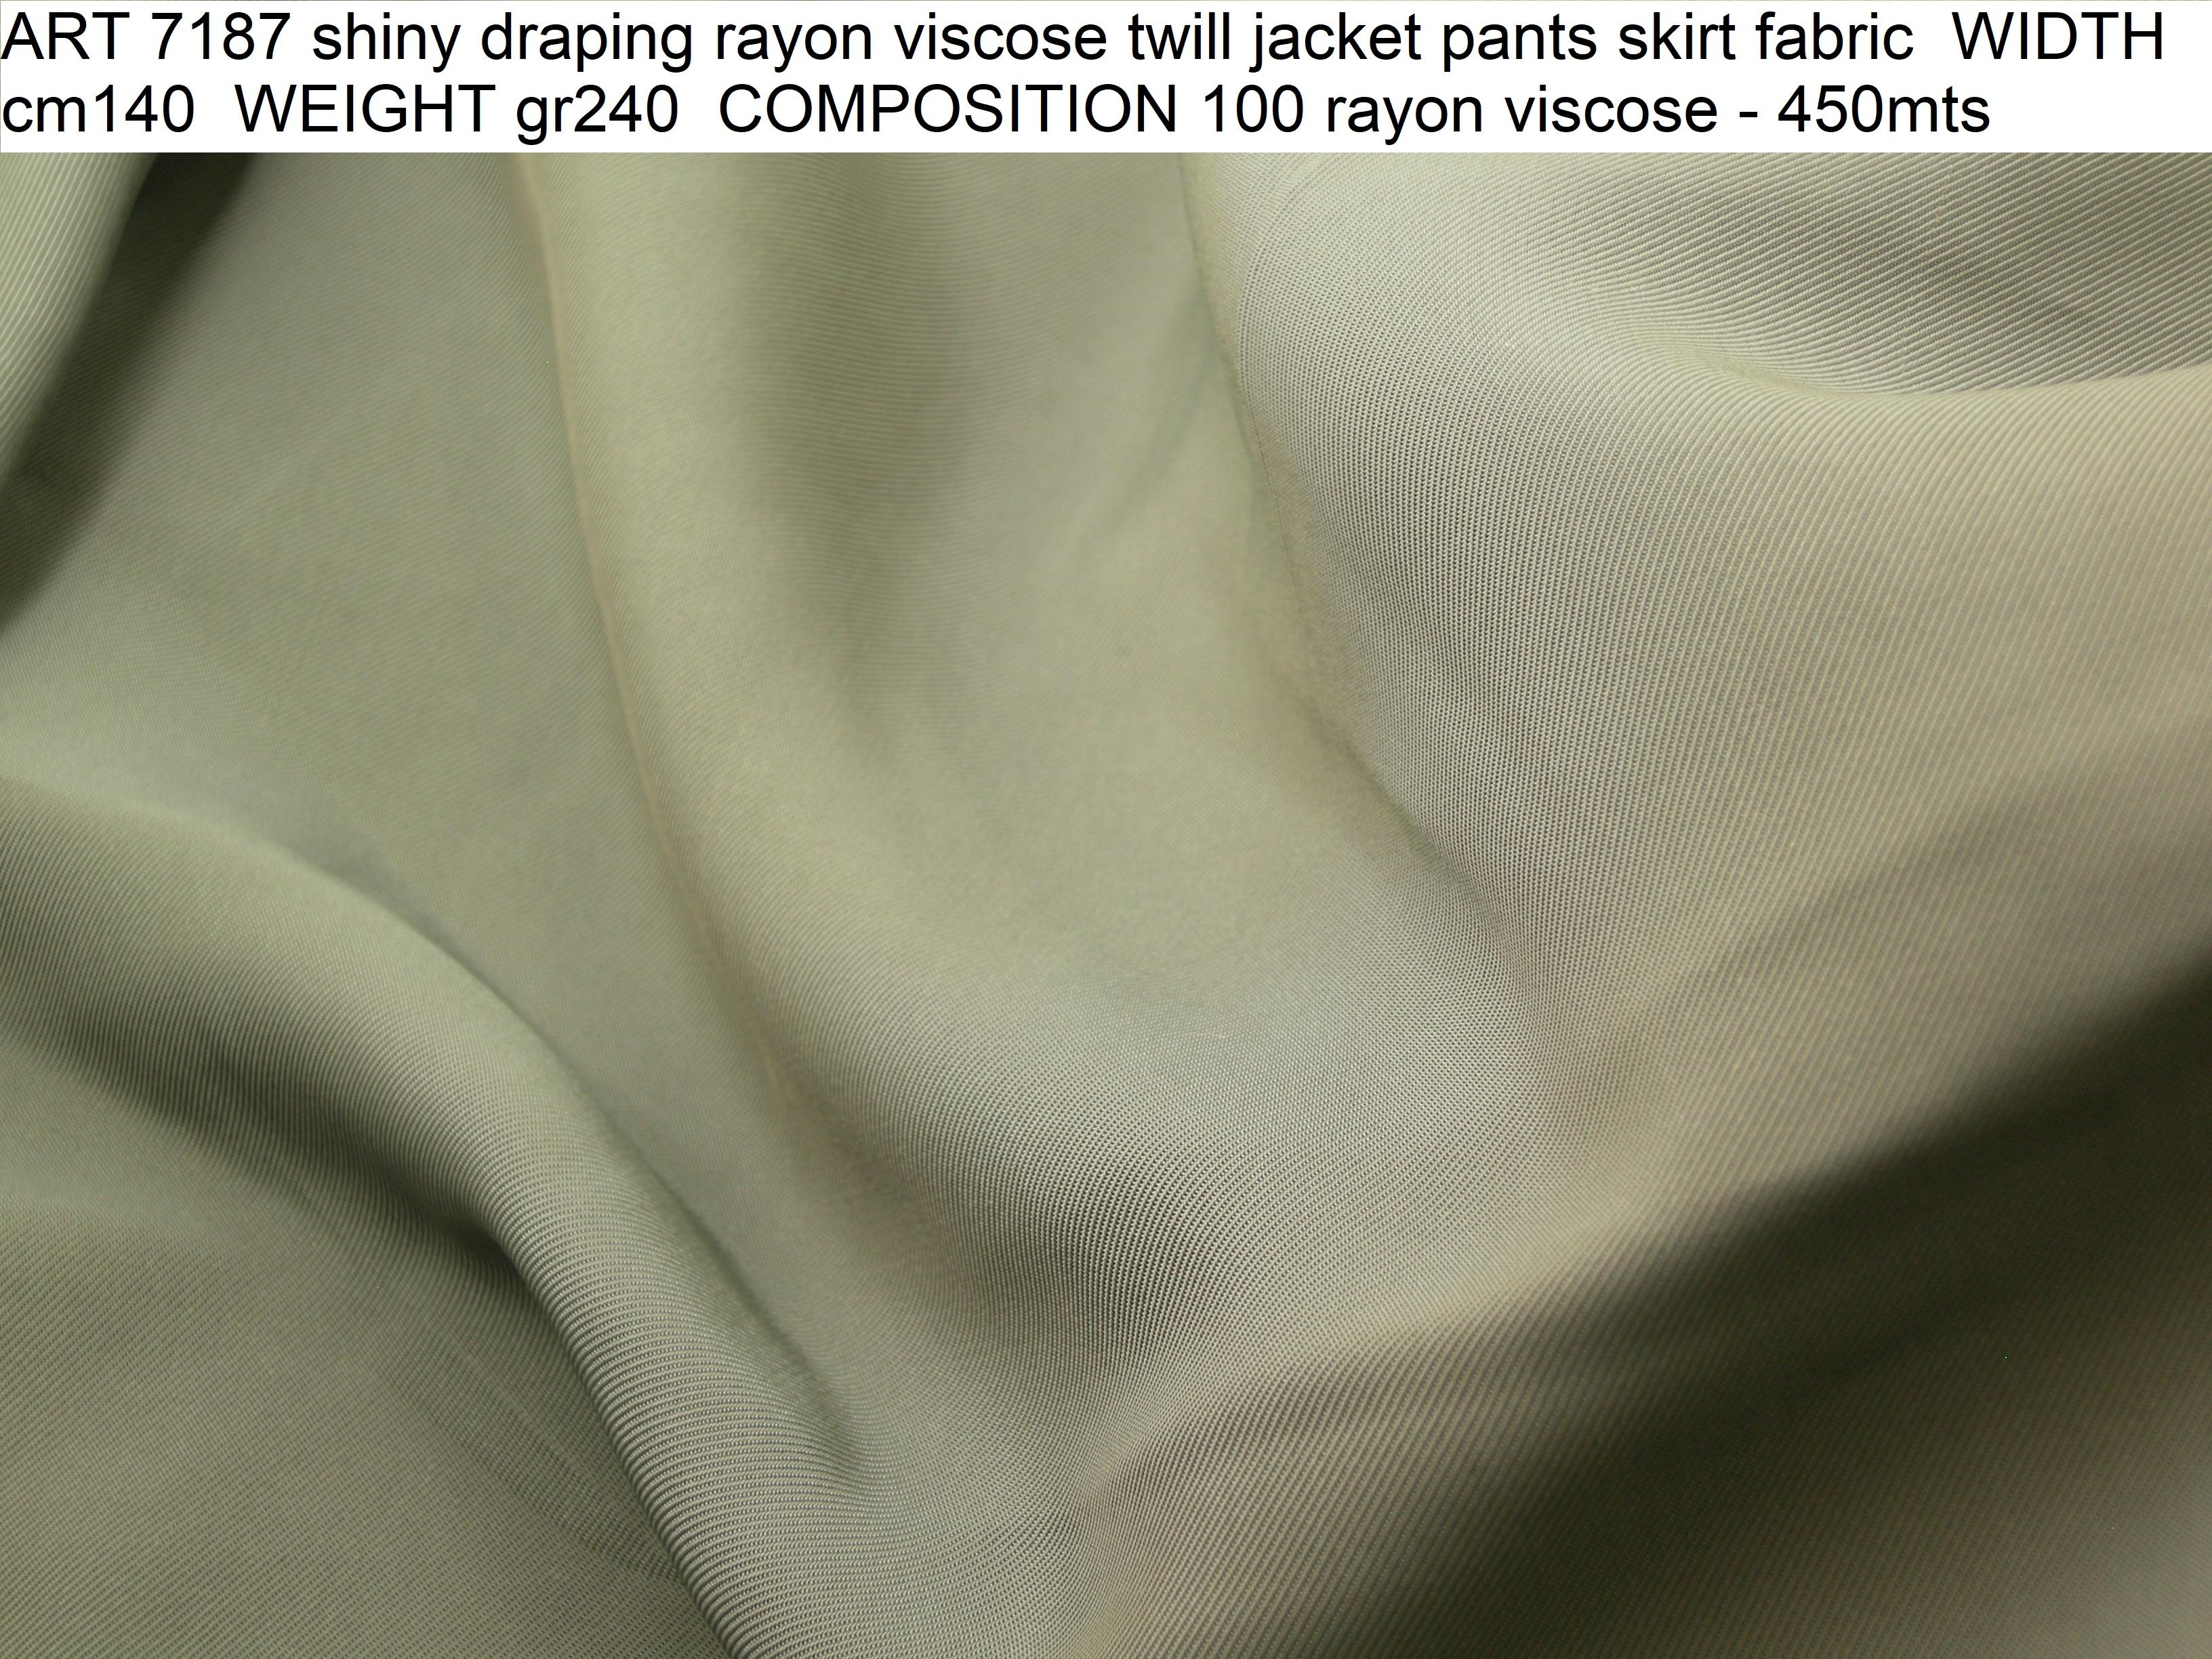 ART 7187 shiny draping rayon viscose twill jacket pants skirt fabric WIDTH cm140 WEIGHT gr240 COMPOSITION 100 rayon viscose - 450mts